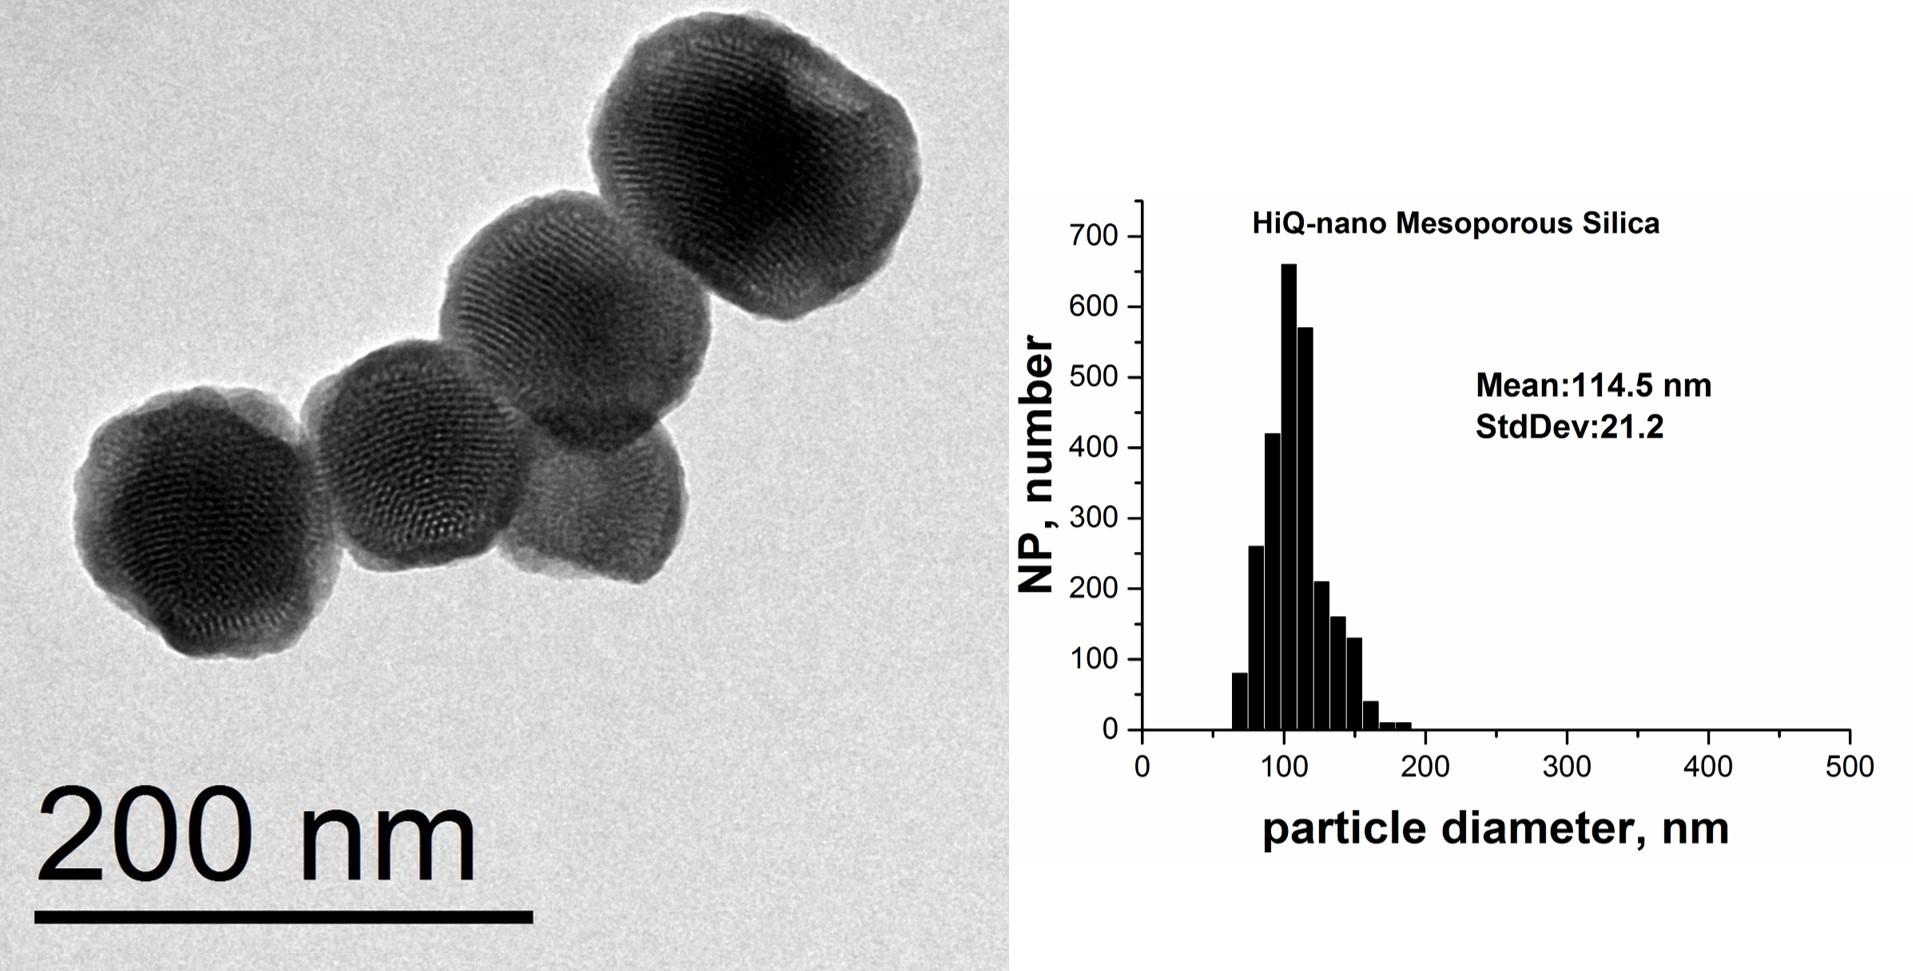 Mesoporous Silica Nanoparticles